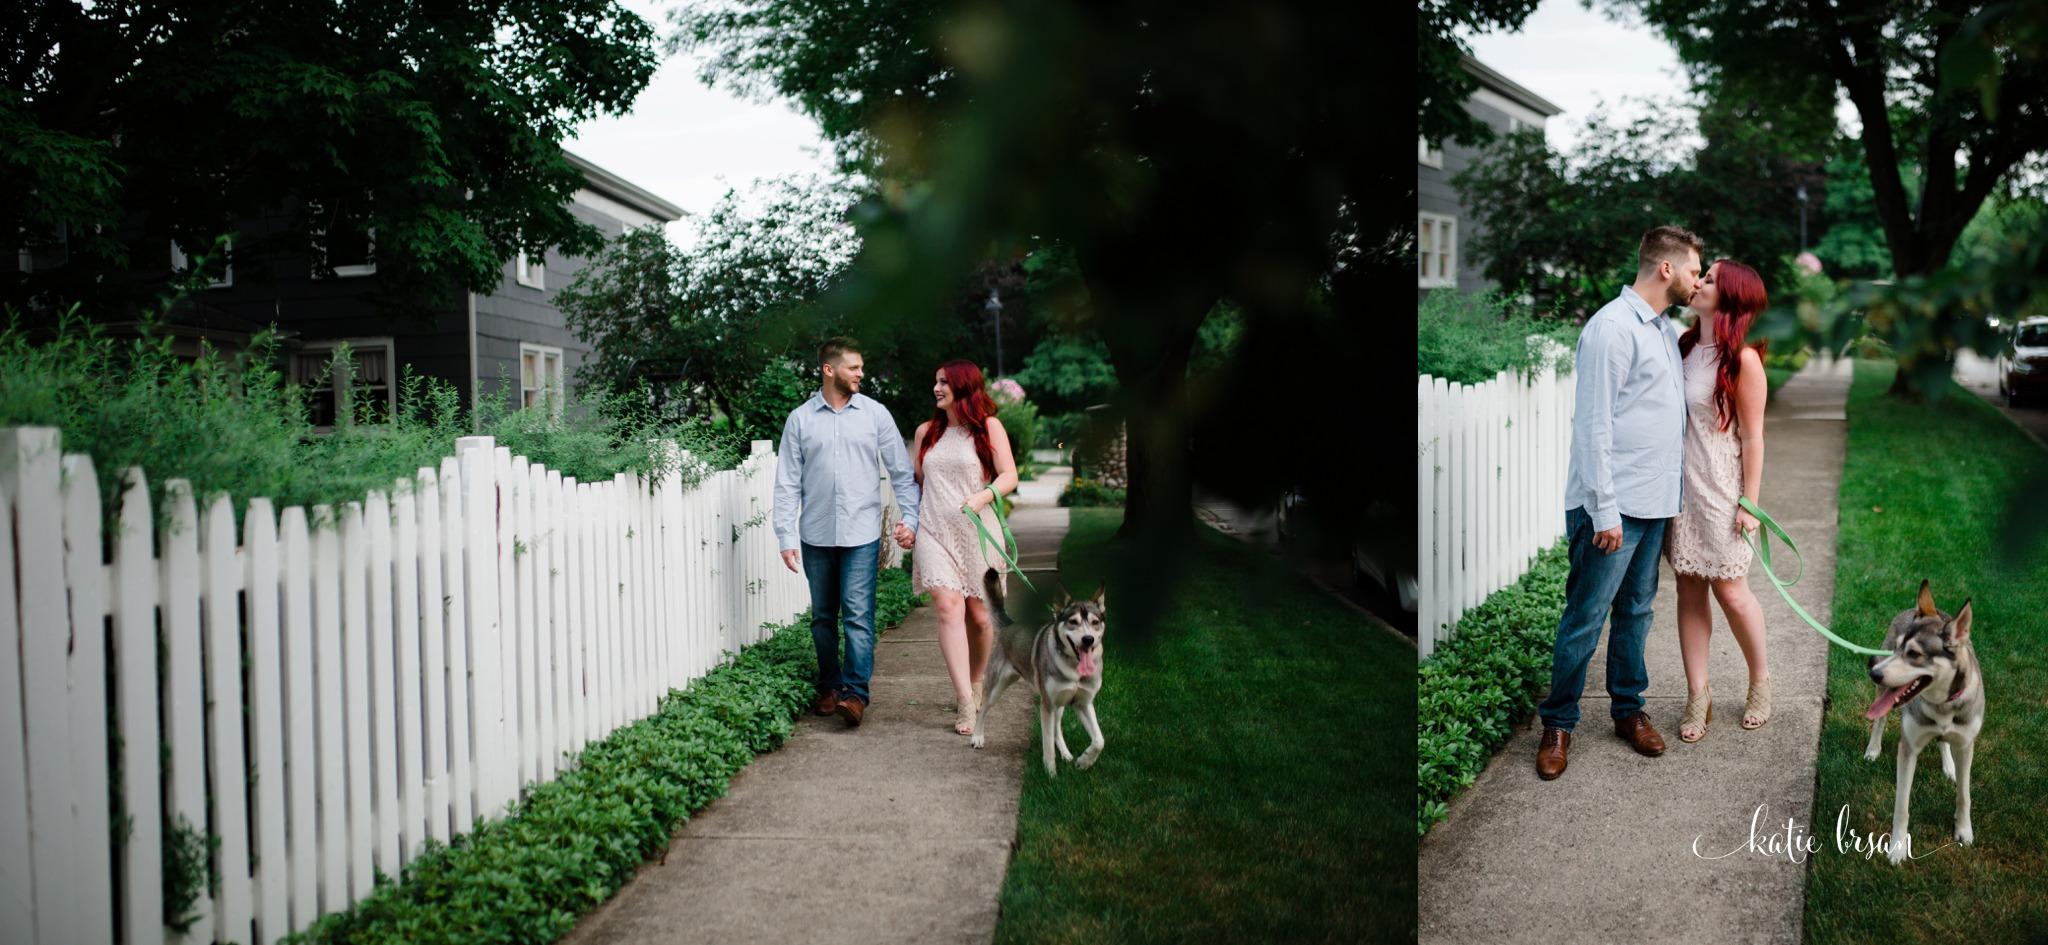 Frankfort-engagementsession-plainfieldwedding_0198.jpg